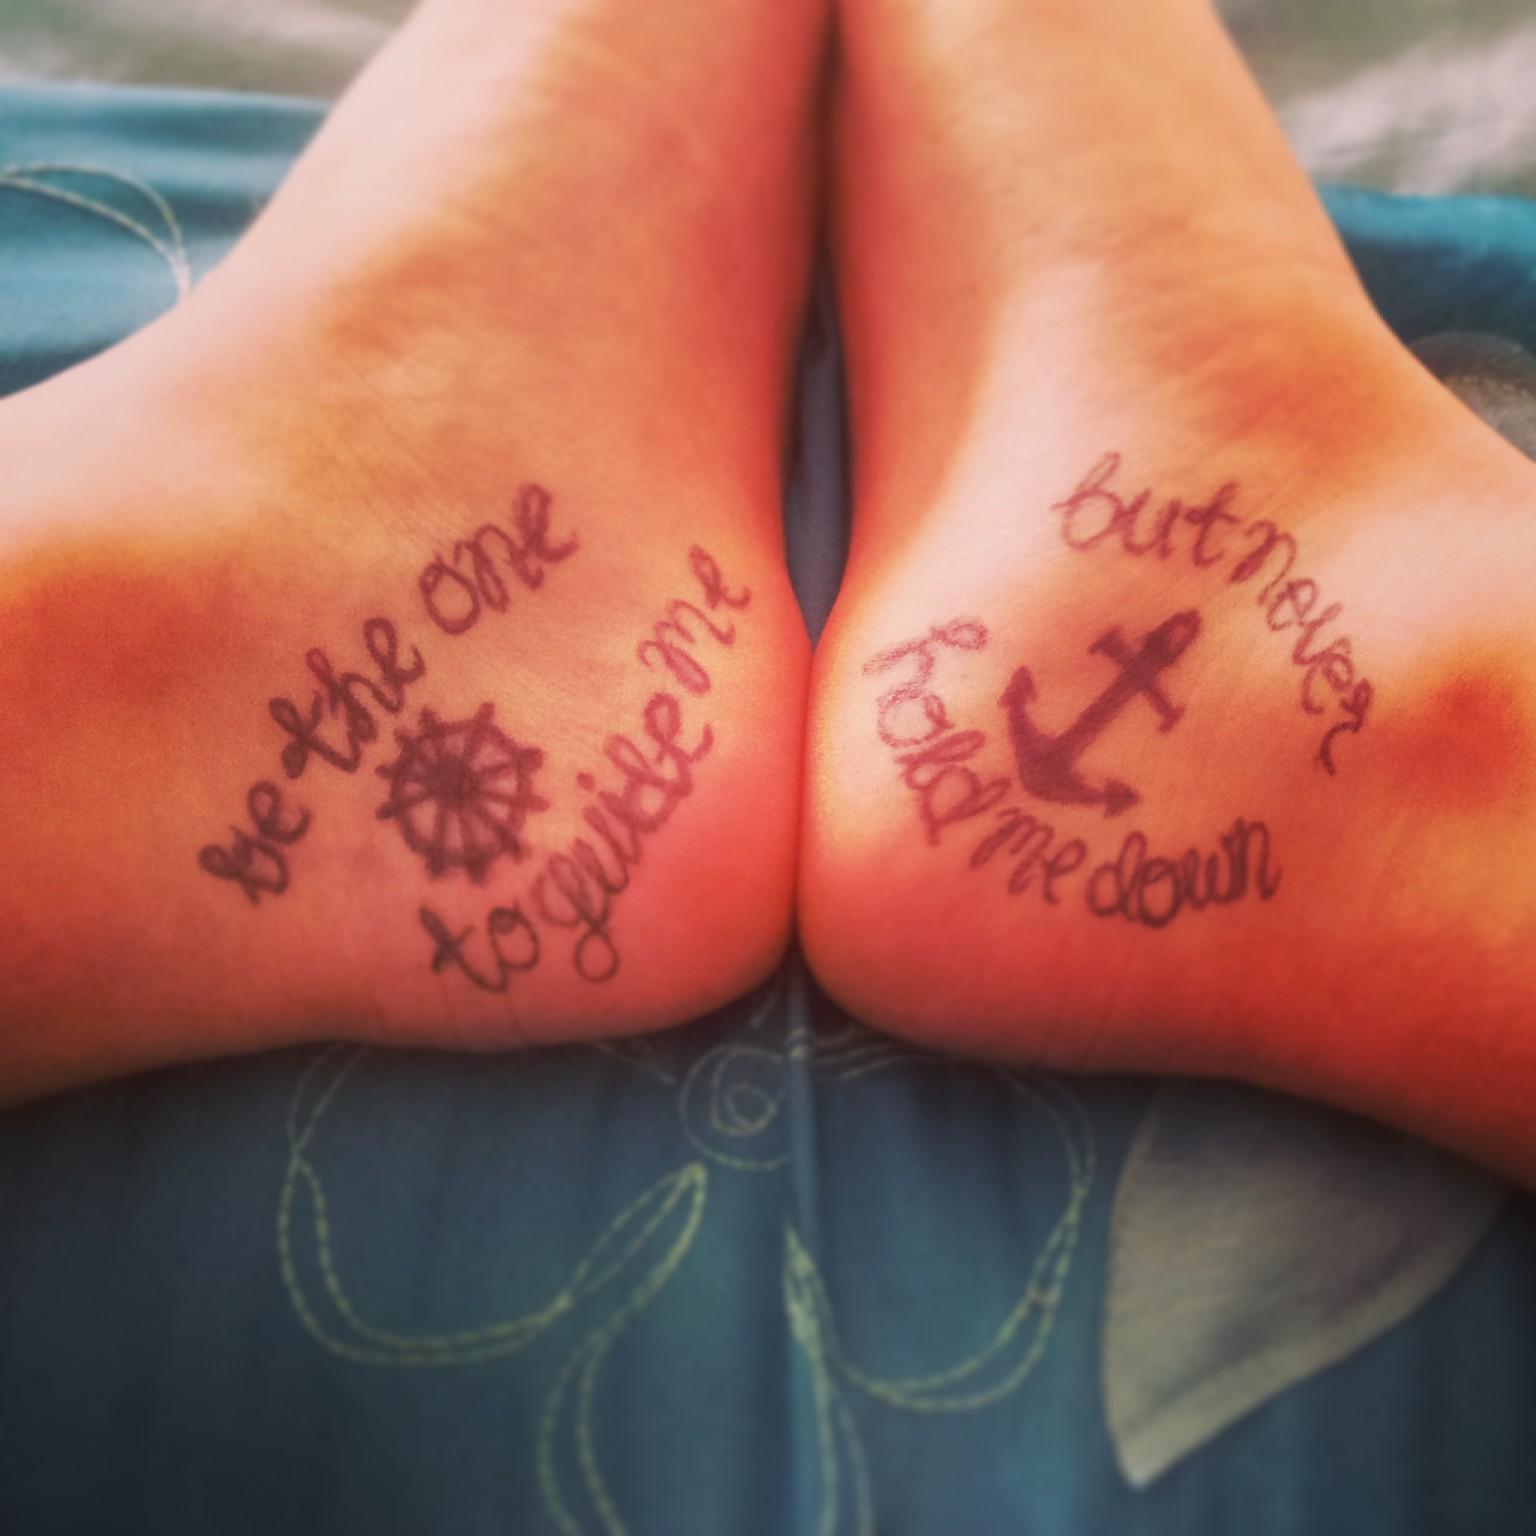 Beauty by a geek diy temporary tattoos for Fake tattoo hairspray